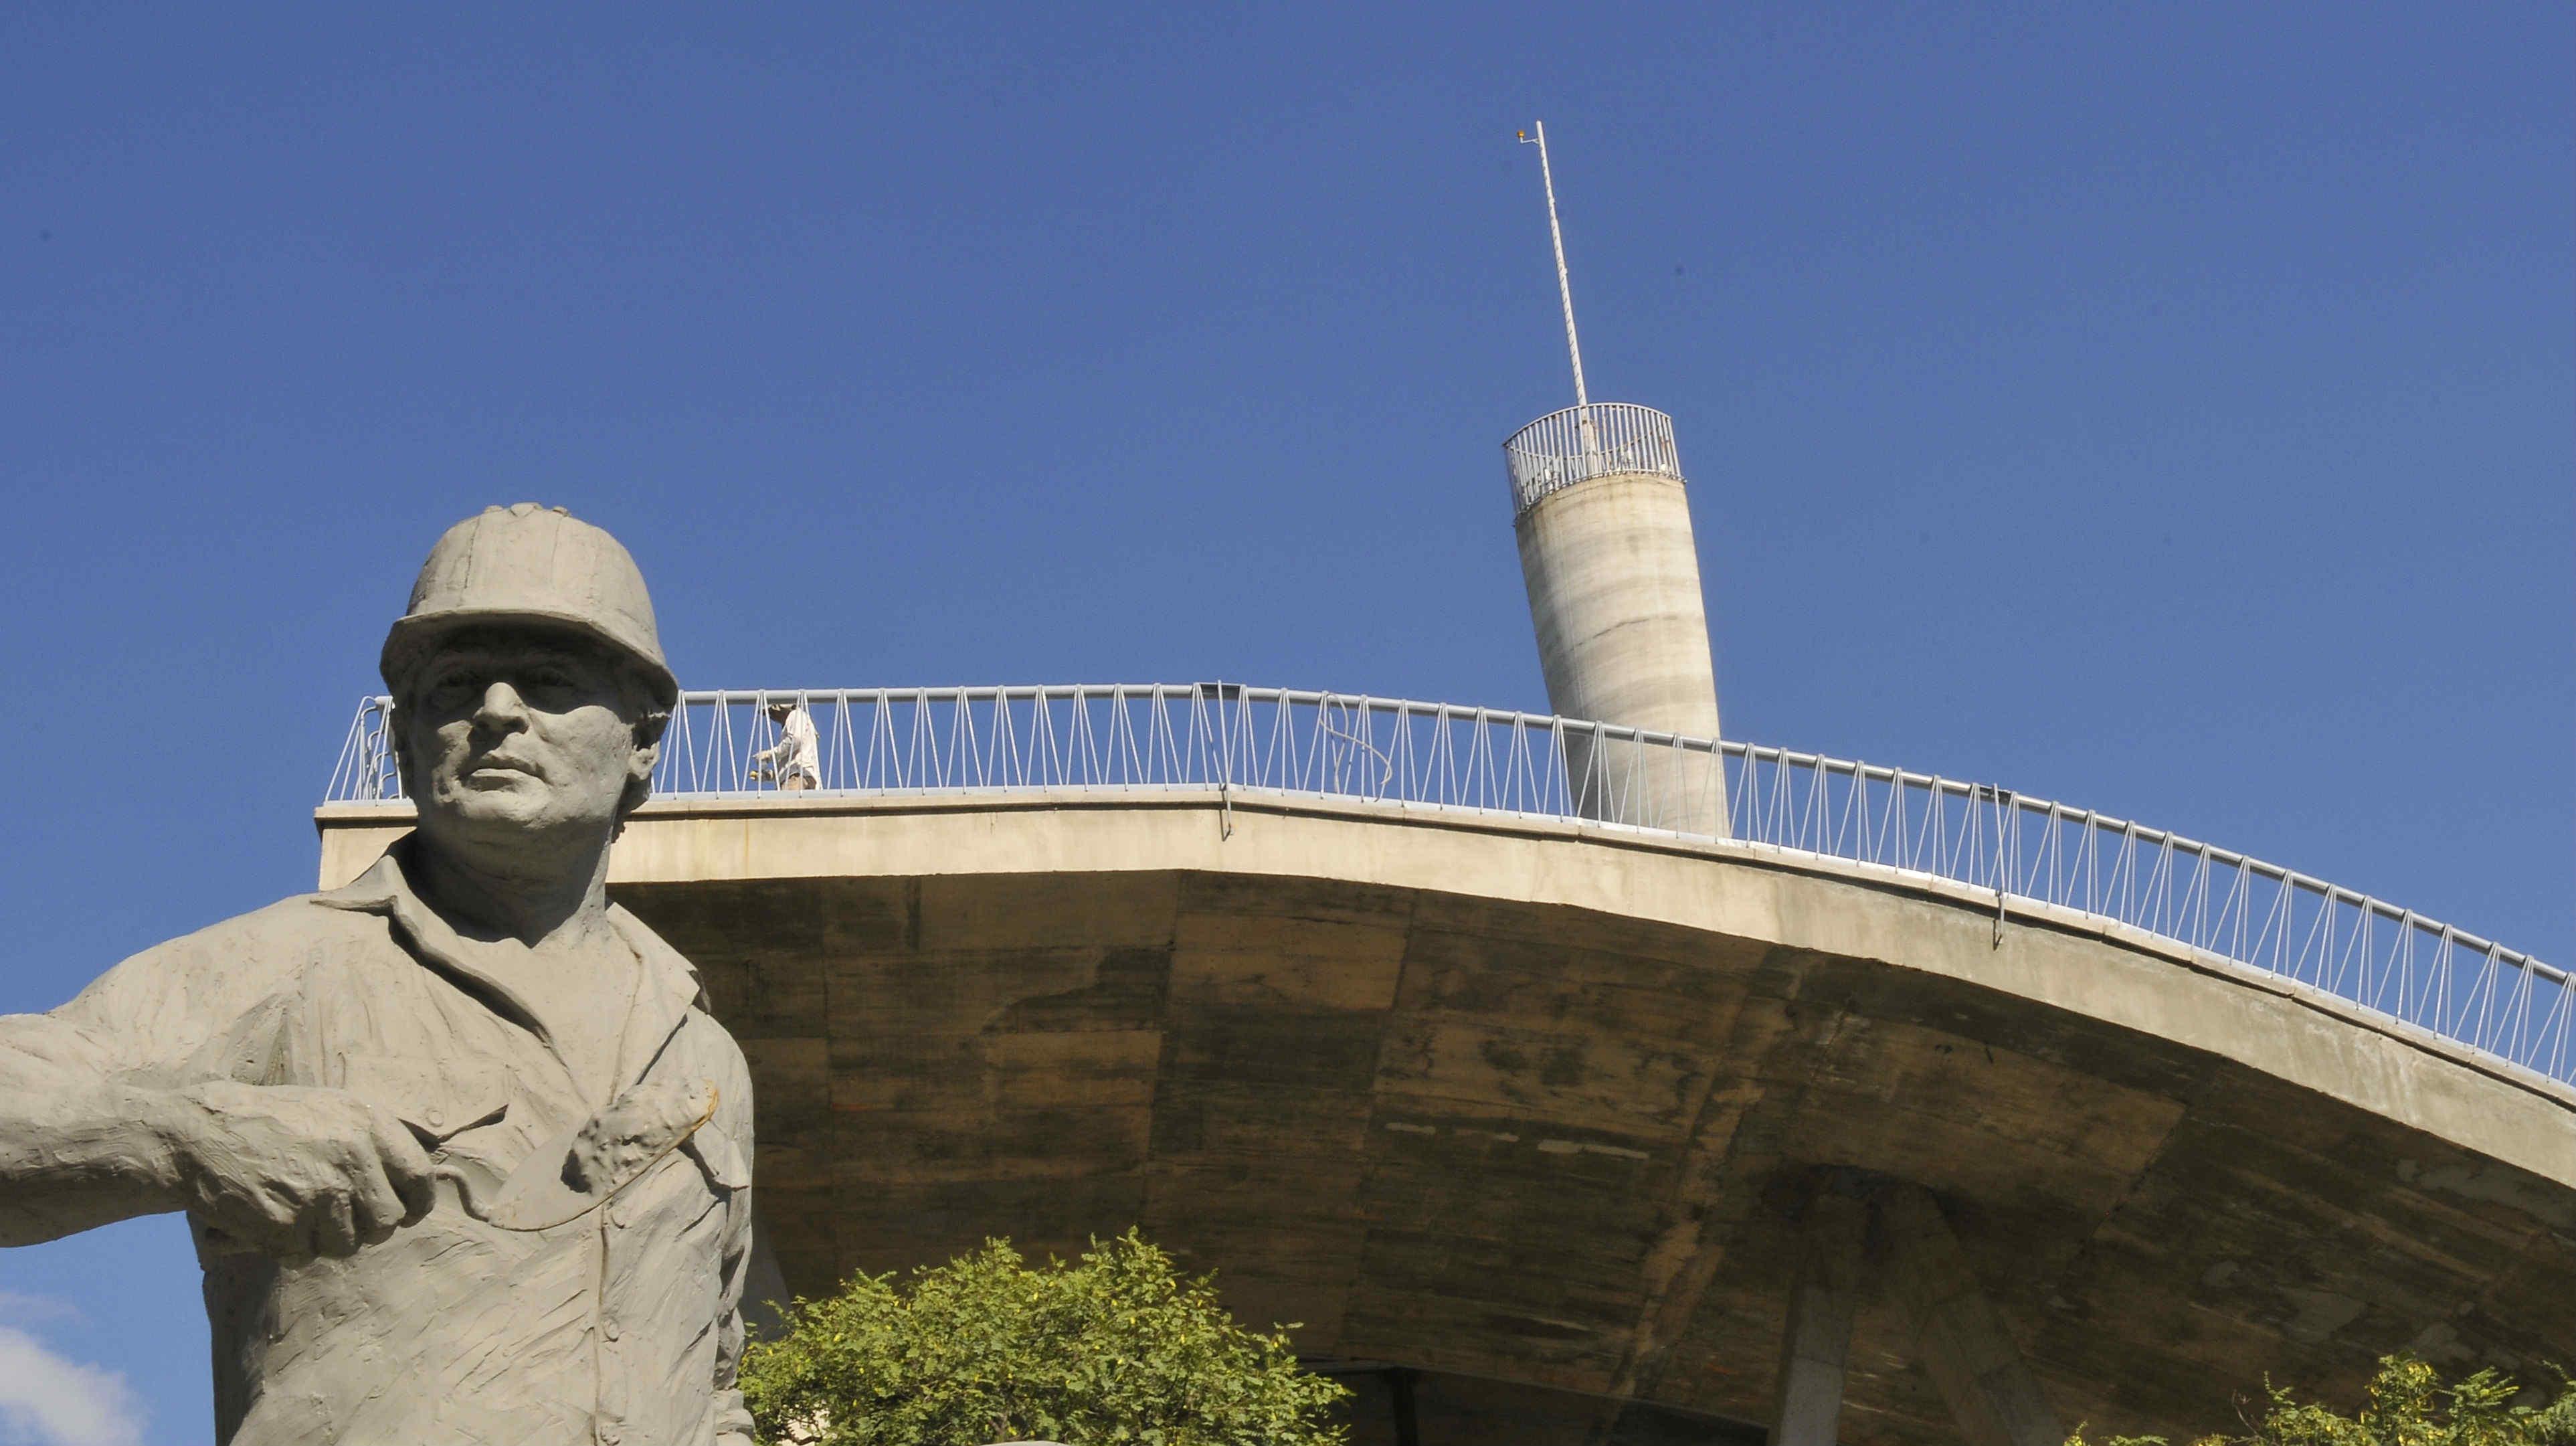 La estatua olvidada de nueva c rdoba la voz del interior for Lavoz del interior cordoba